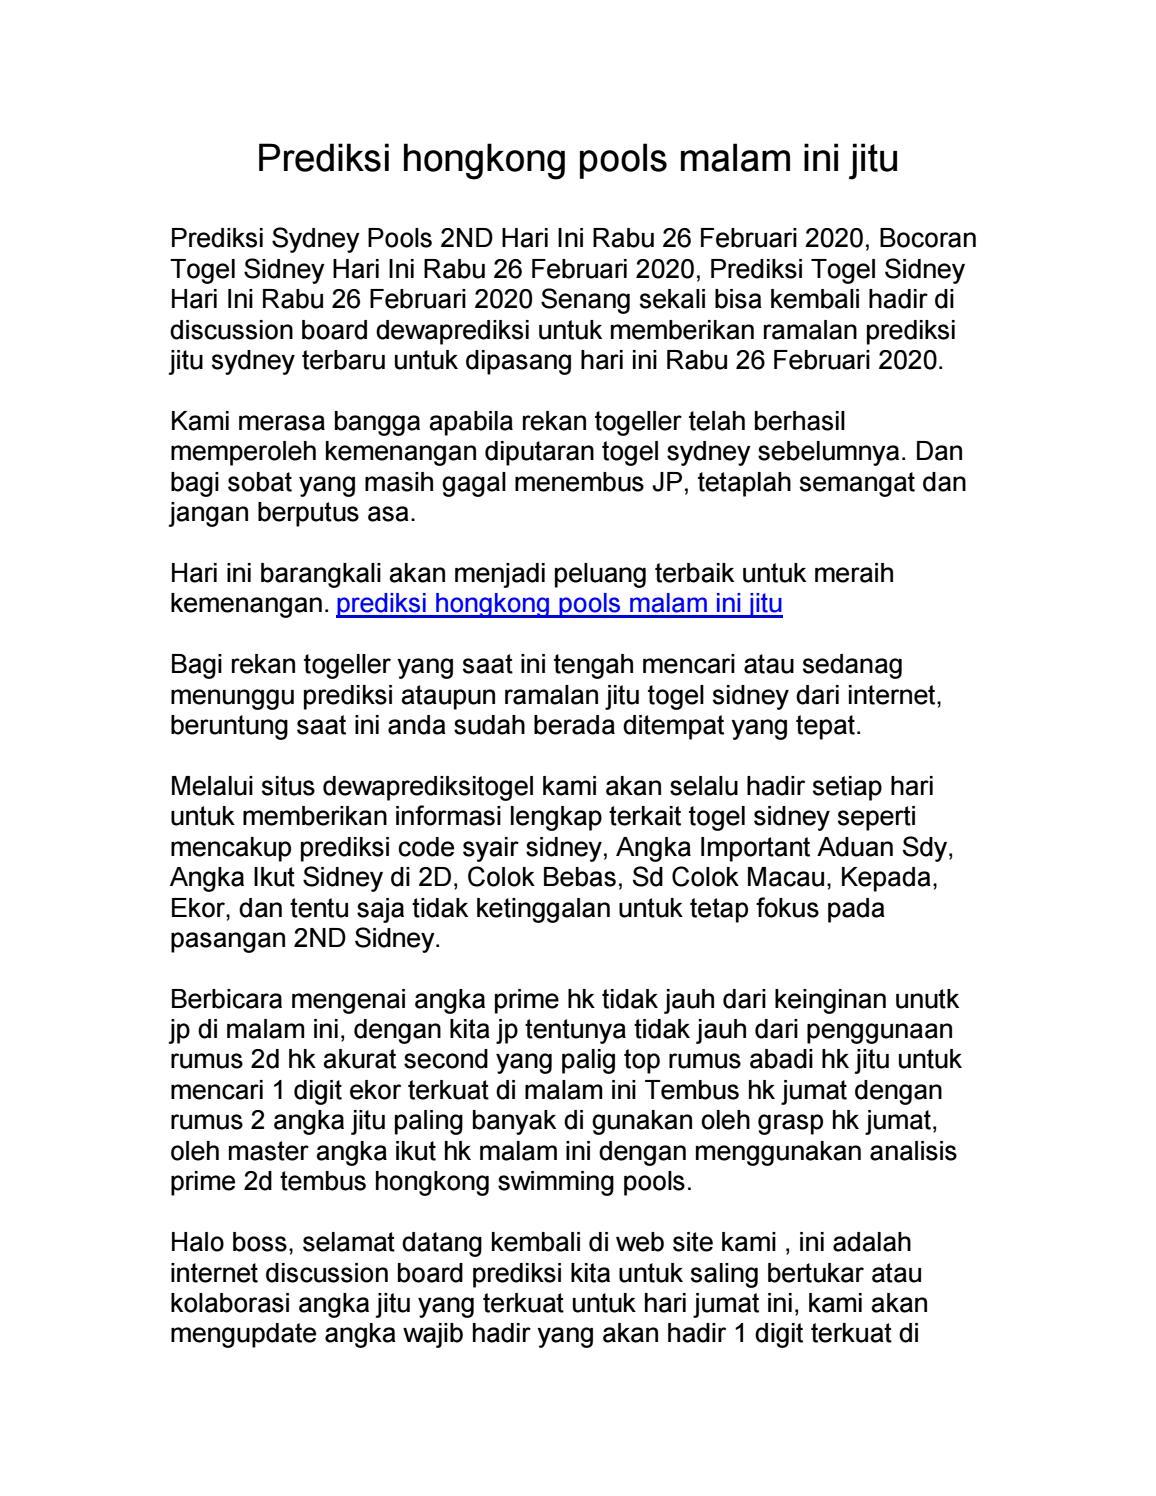 Prediksi Hongkong Rabu 03-02-2021 - Prediksi Hk